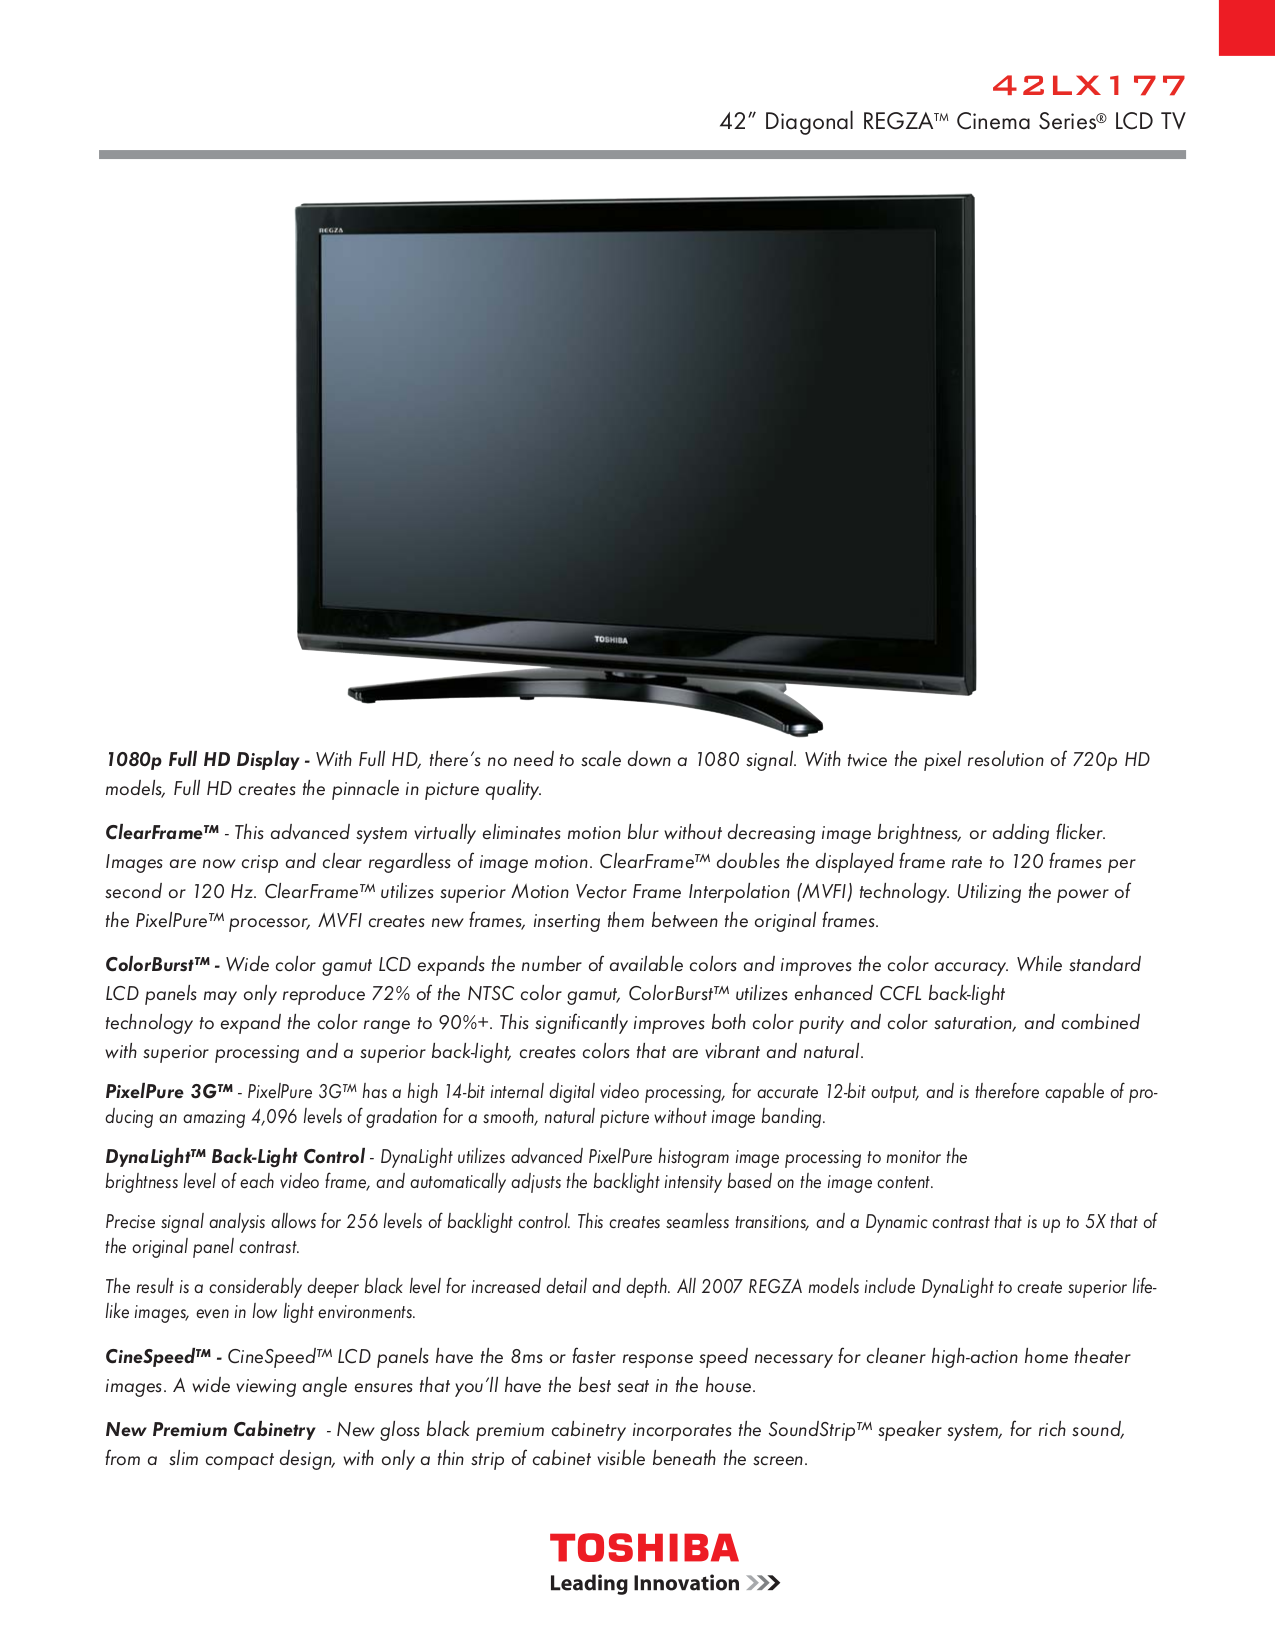 download free pdf for toshiba regza 42lx177 tv manual rh umlib com Toshiba 42 REGZA Manual Toshiba Regza 32 Manual